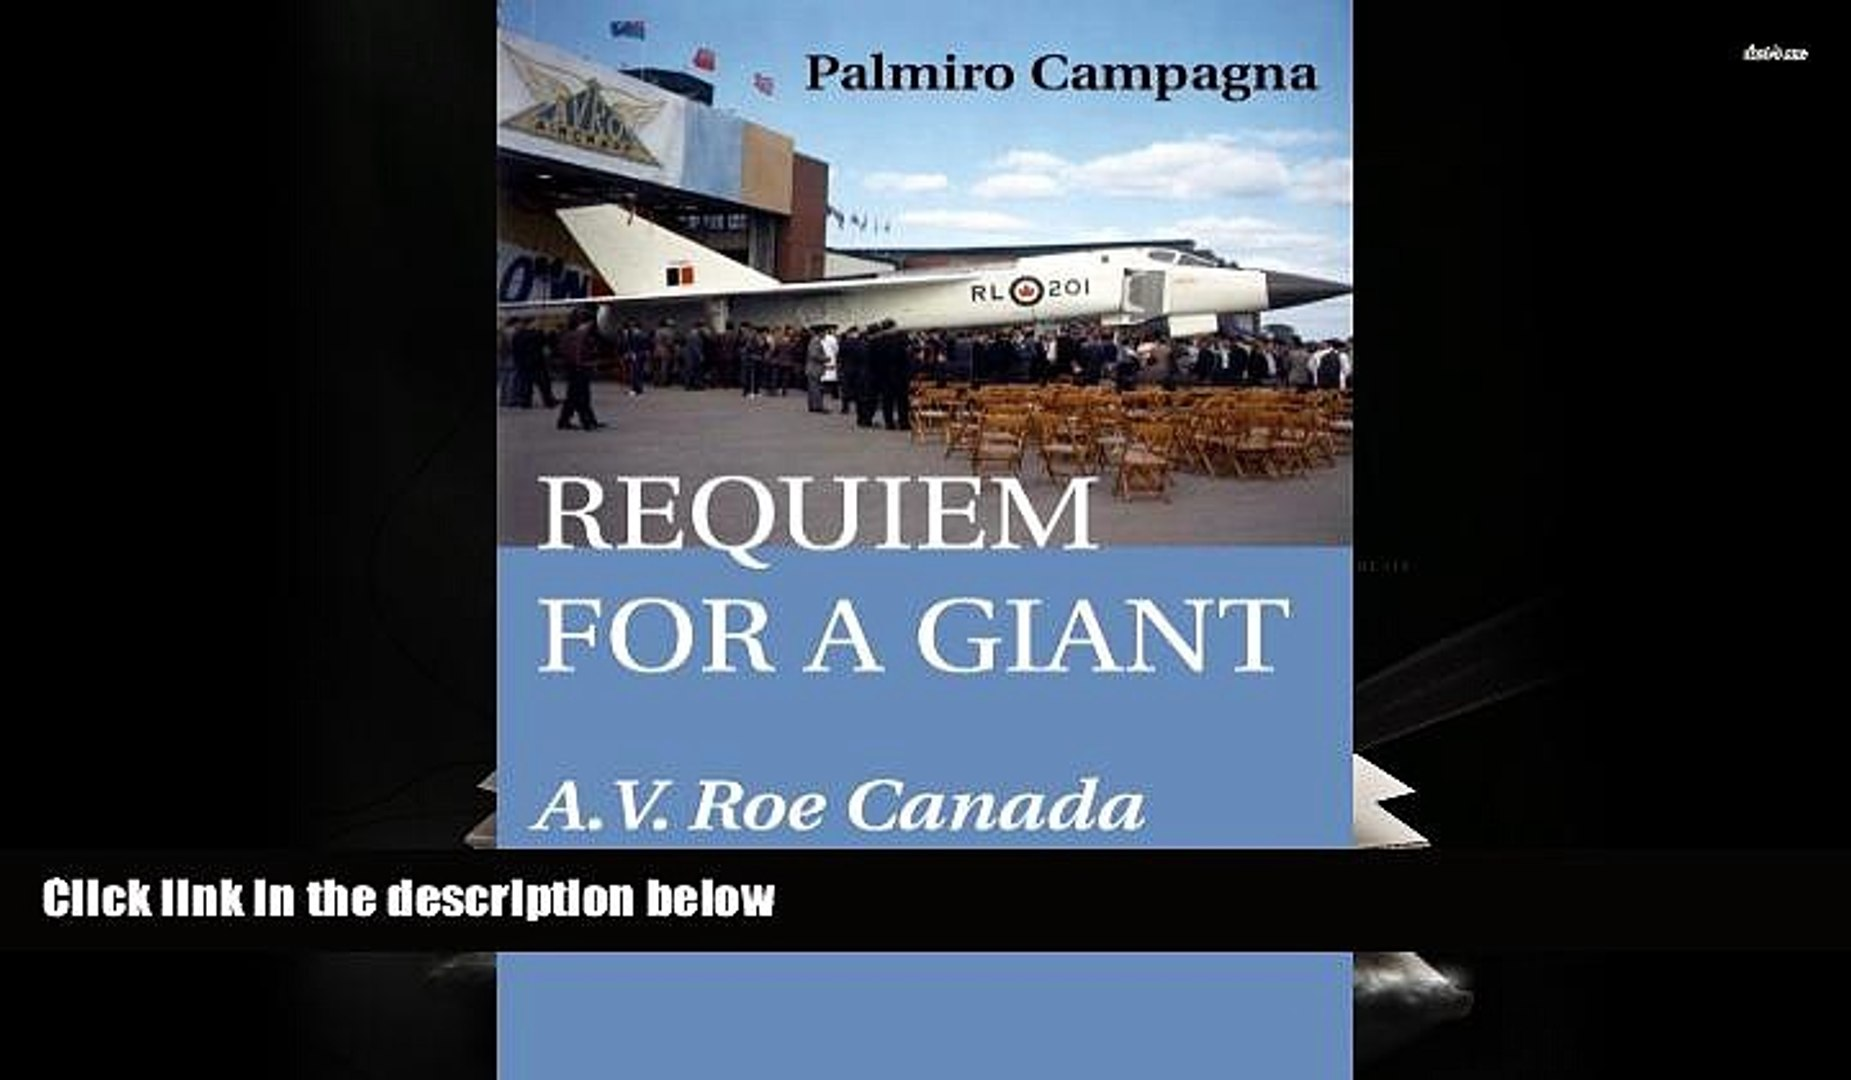 A.V Requiem for a Giant Roe Canada and the Avro Arrow